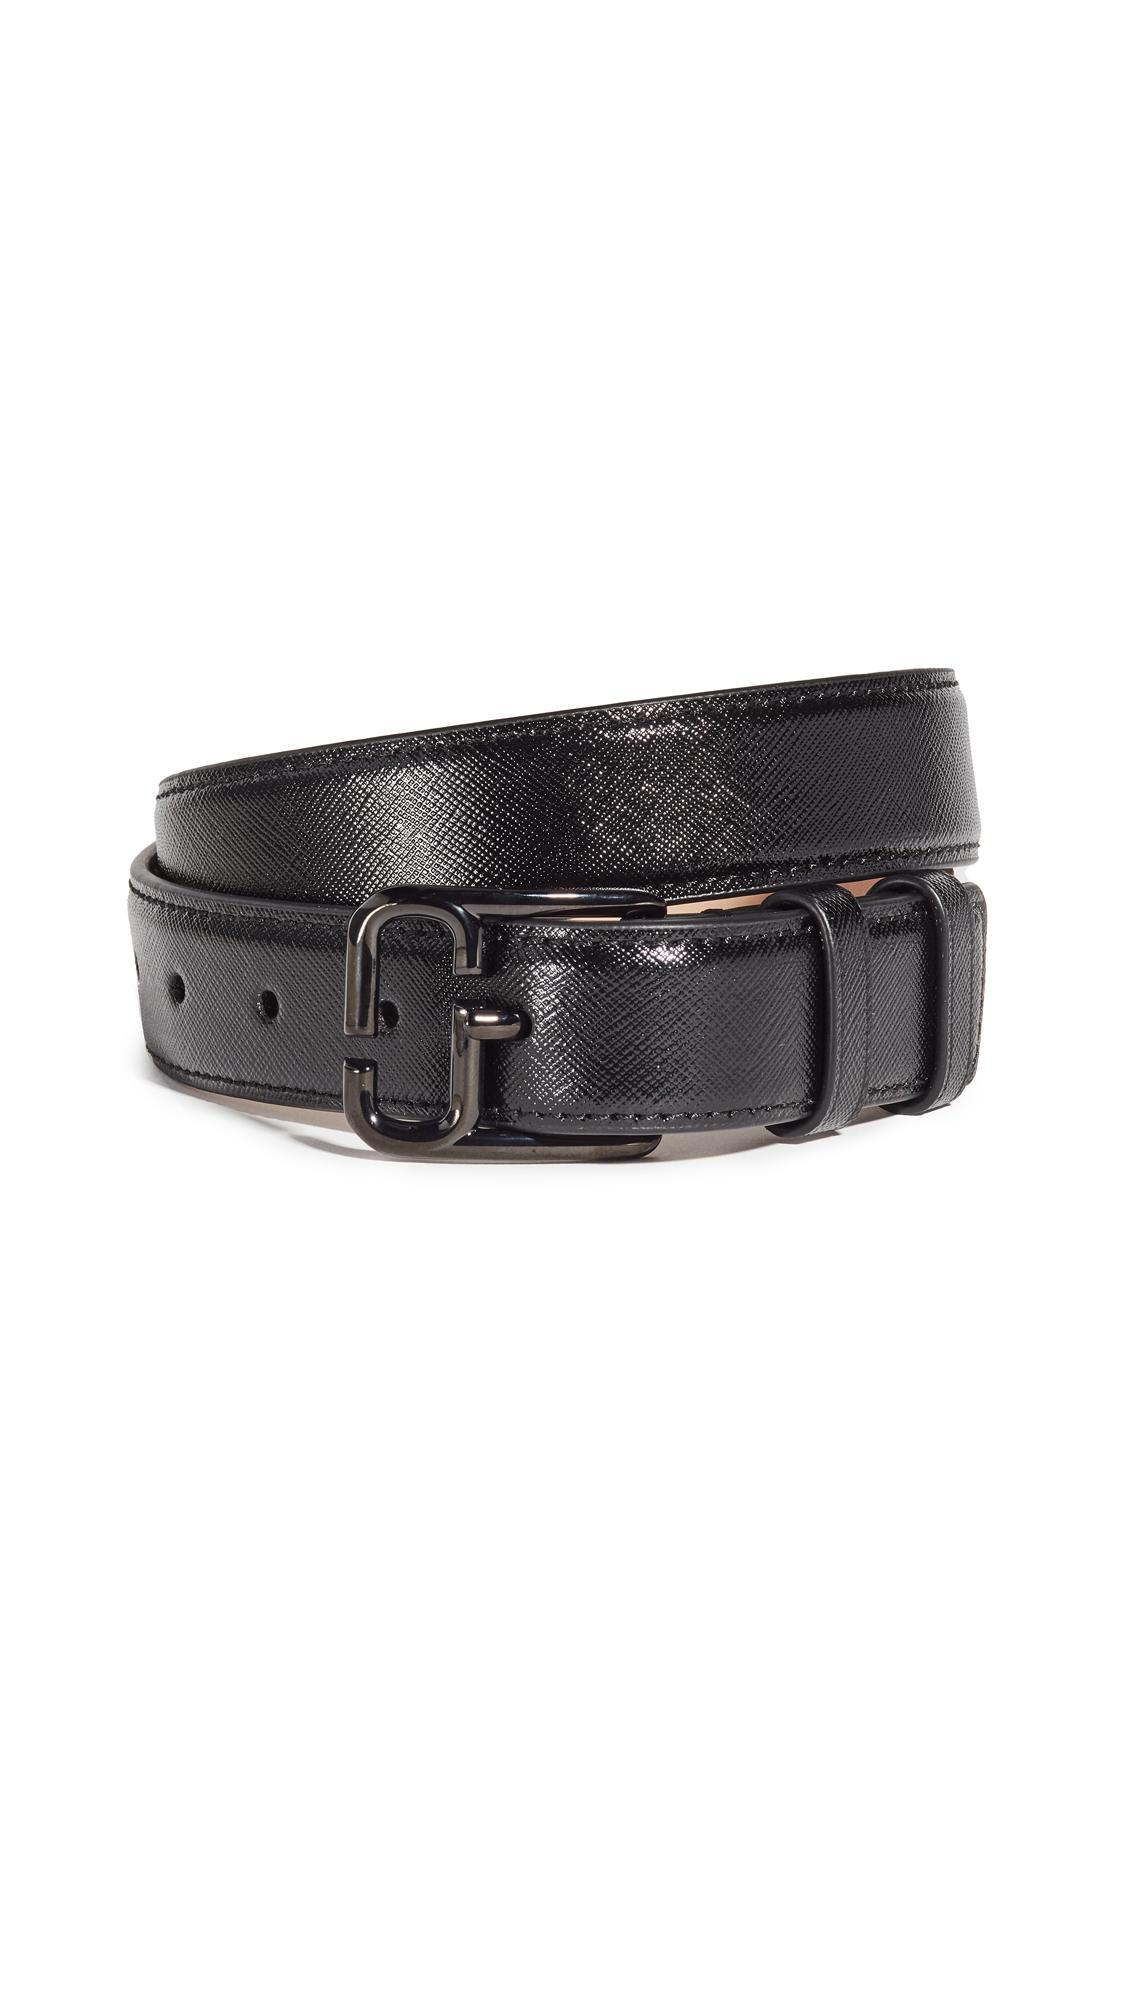 The Marc Jacobs 3cm Wide Belt